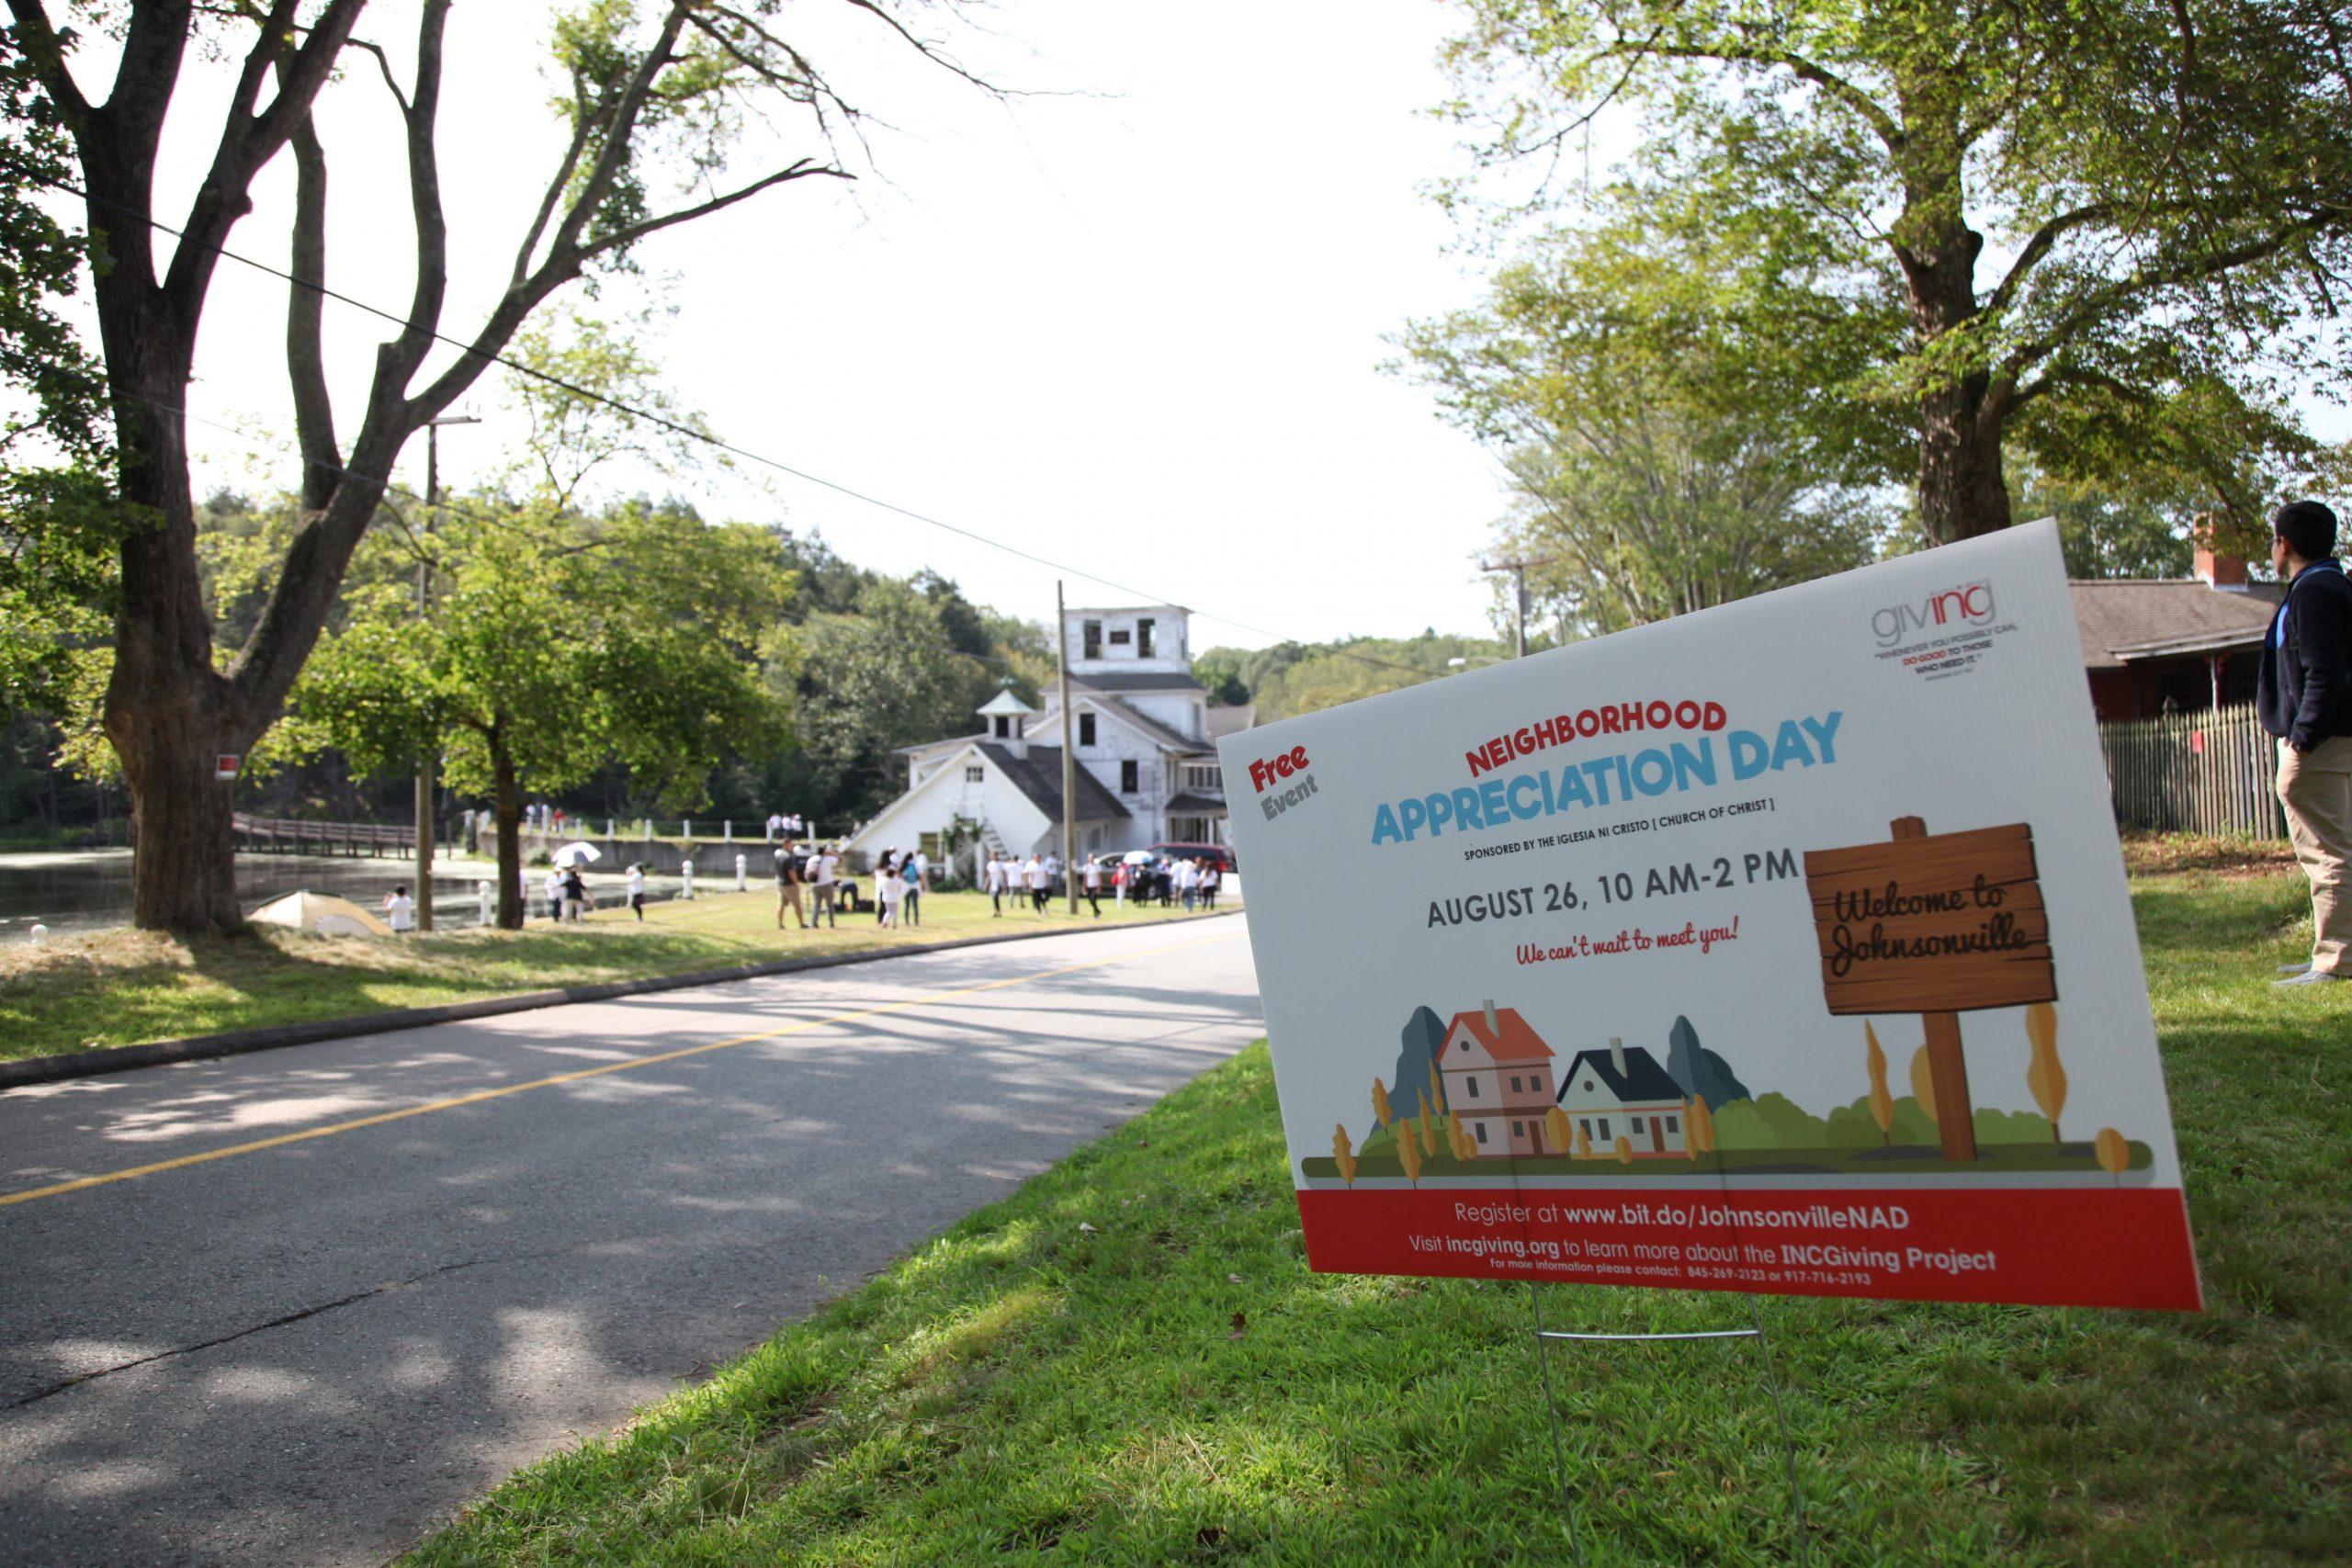 Neighborhood Appreciation Day in Johnsonville, Connecticut